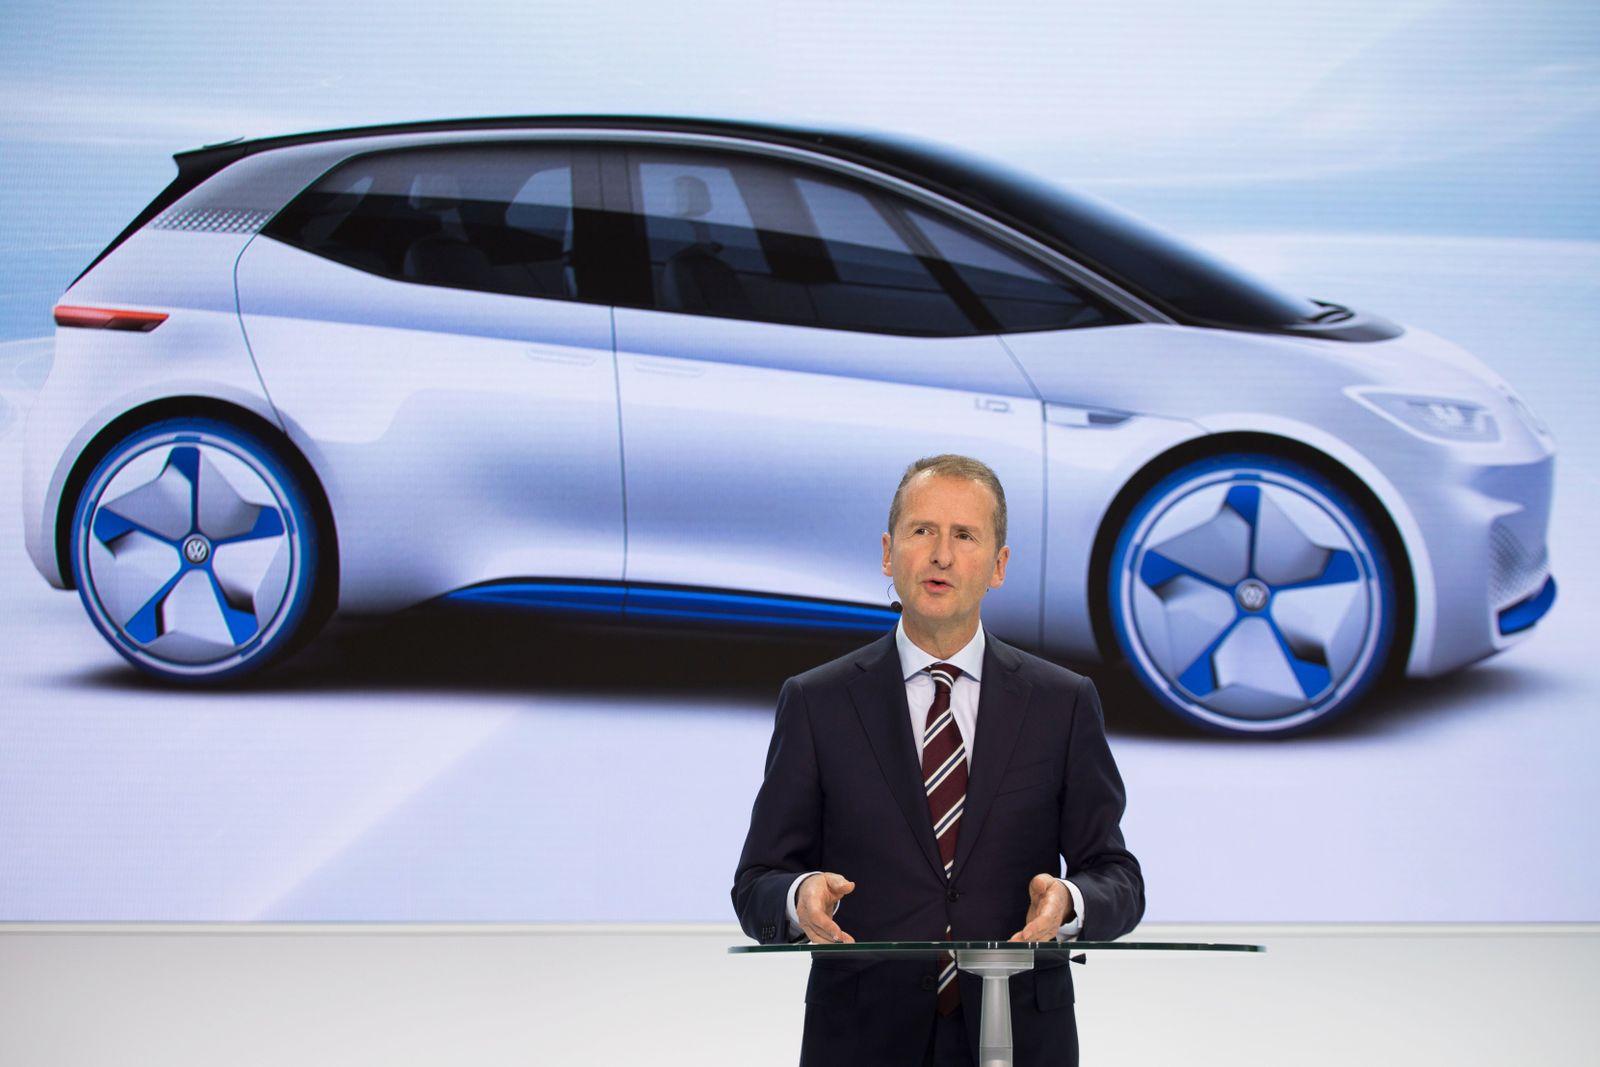 Herbert Diess / VW